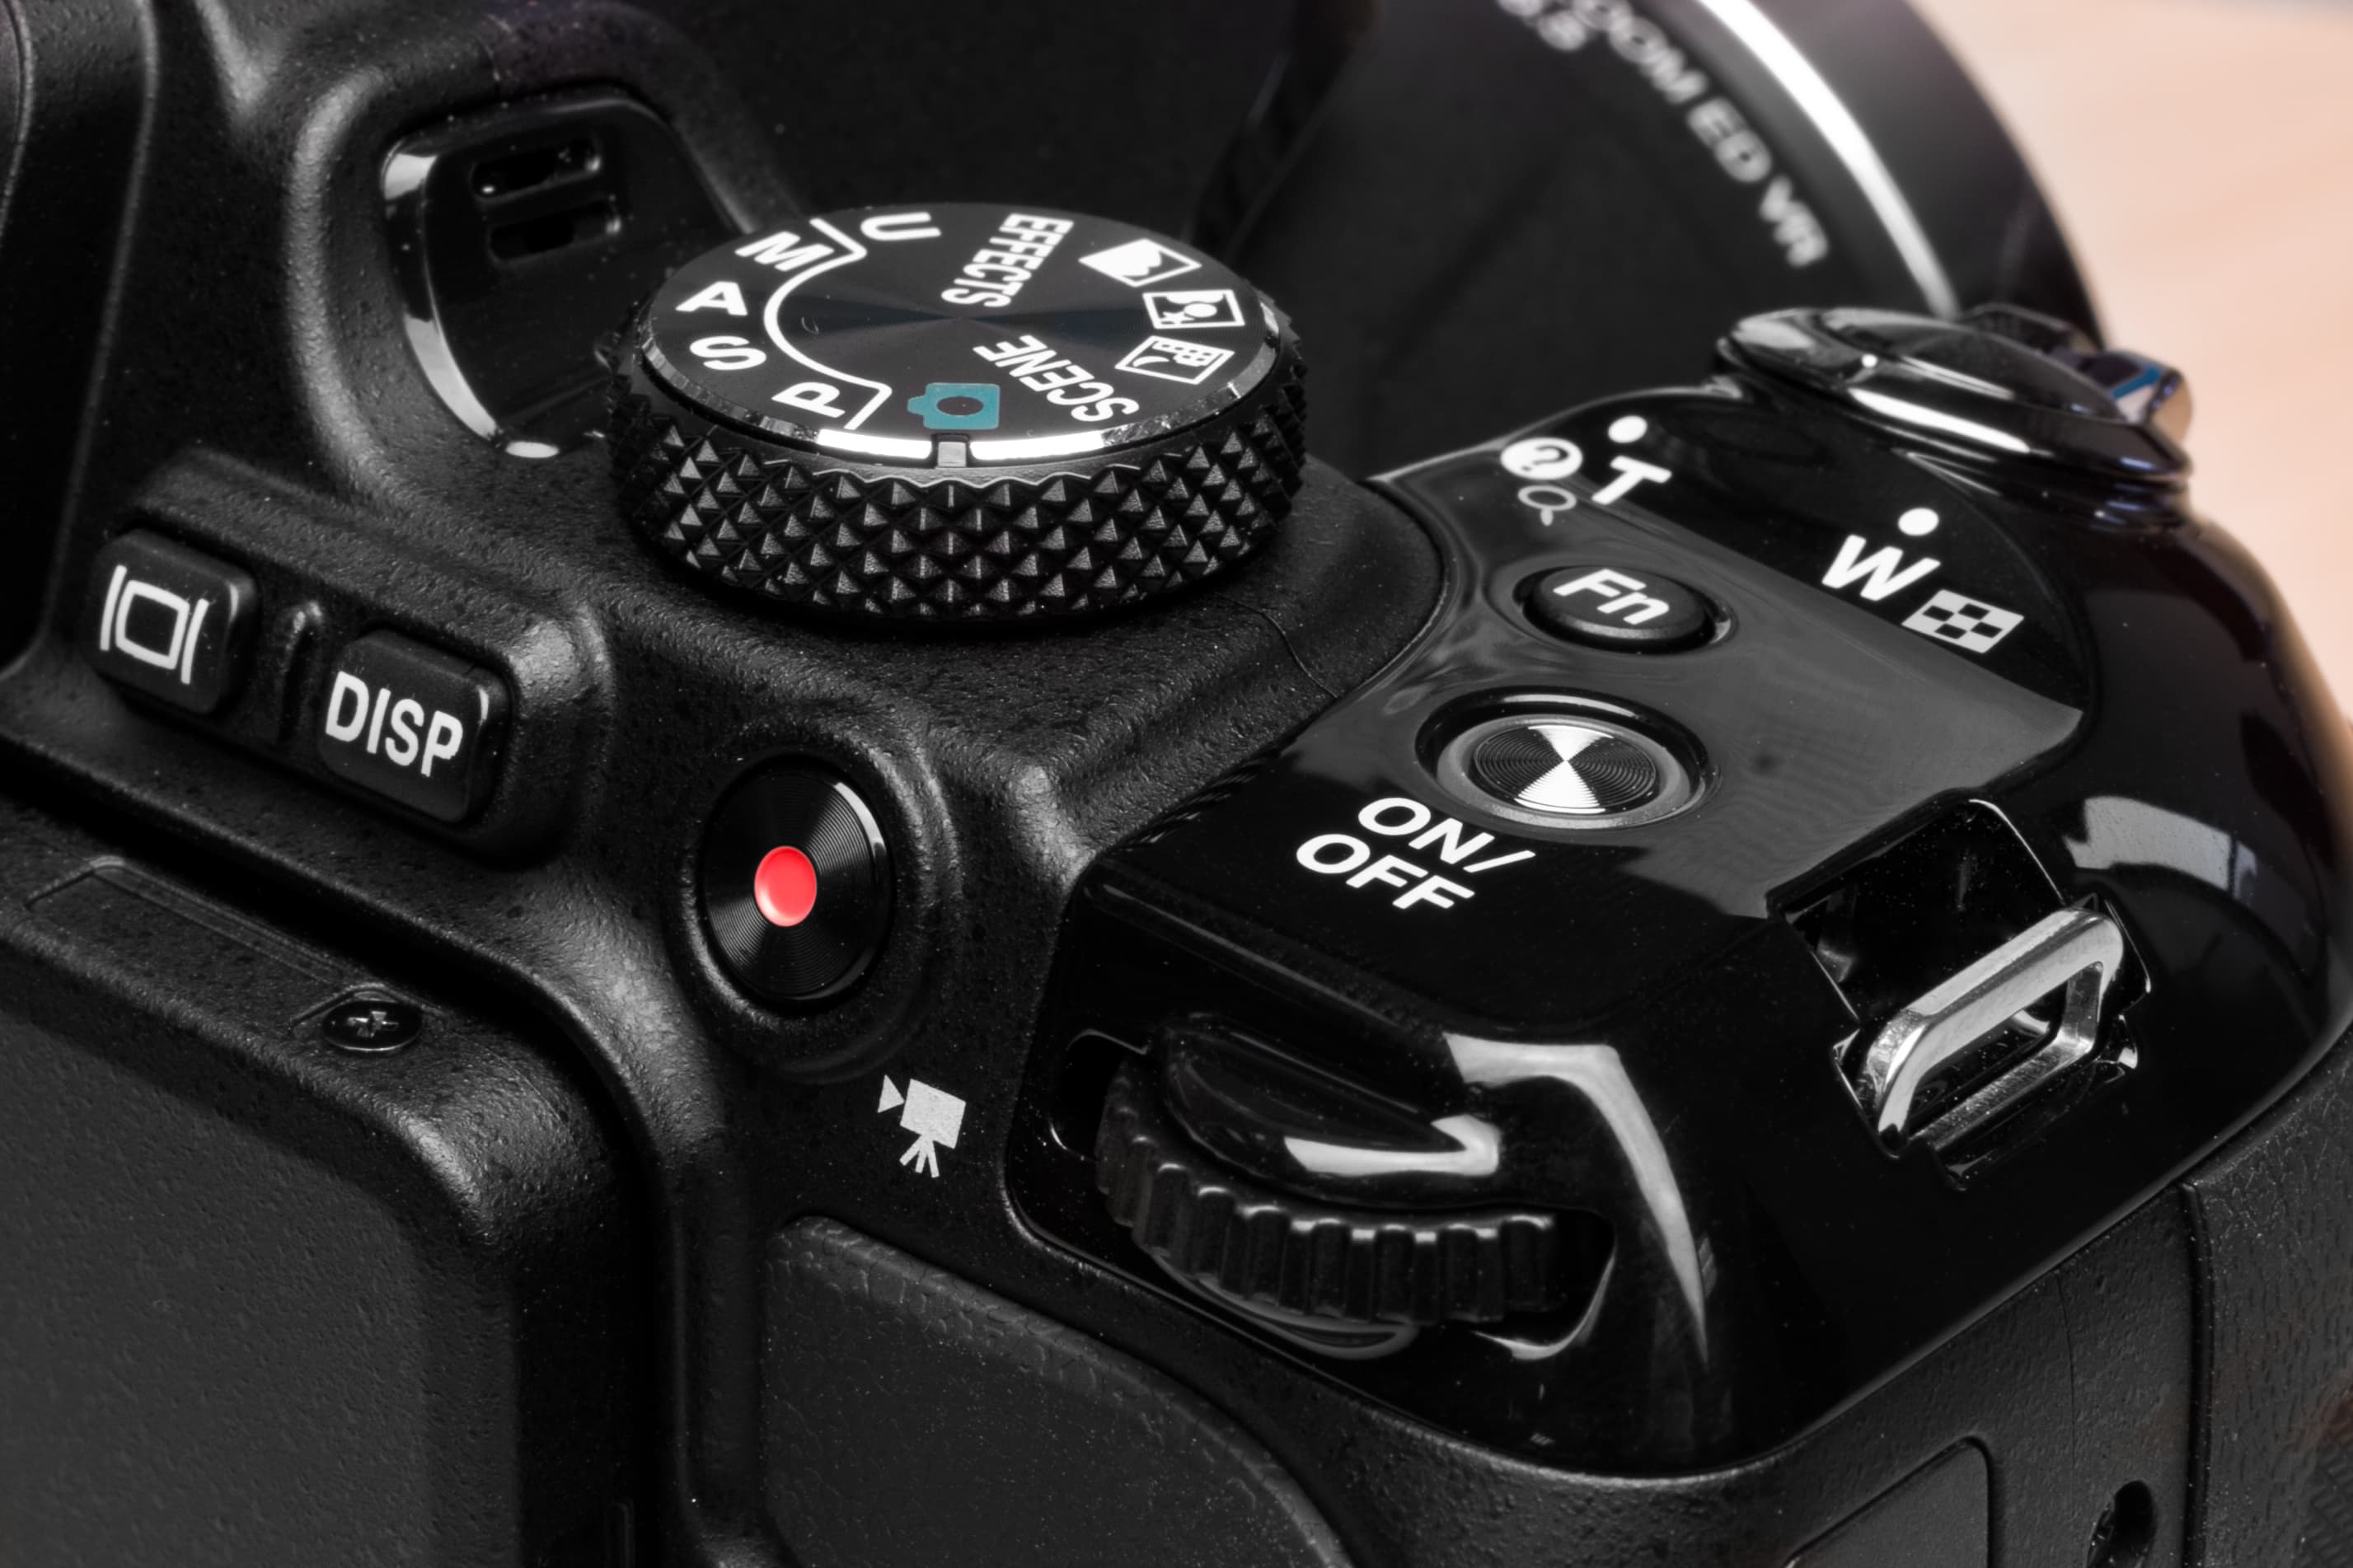 A picture exploring the Nikon Coolpix P600 closer.